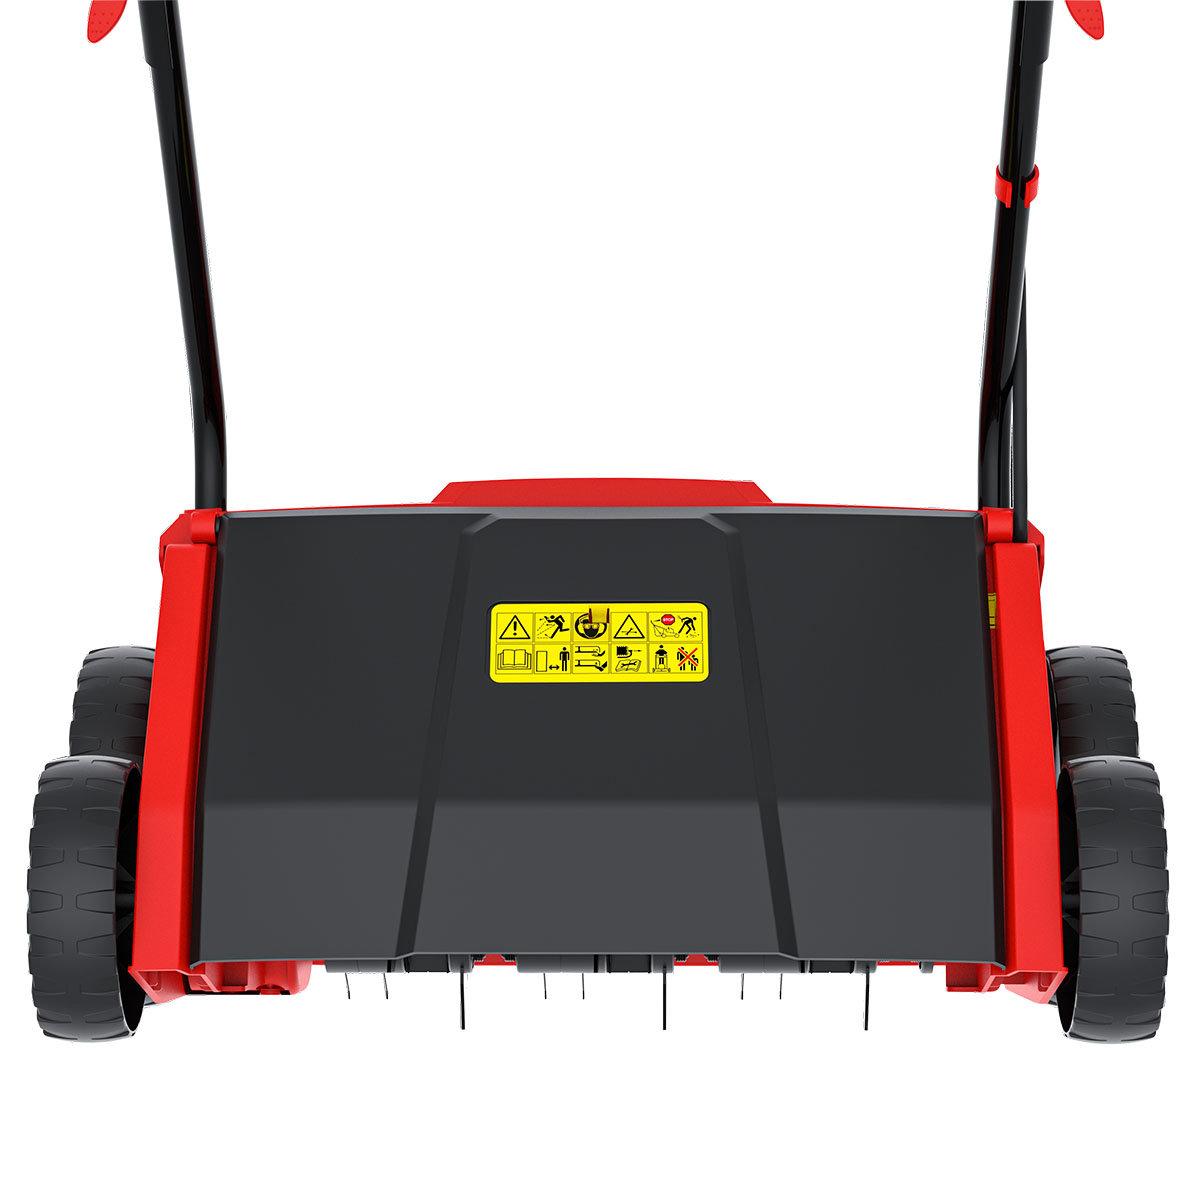 Elektro-Vertikutierer GVZ 1432 2in1 | #6